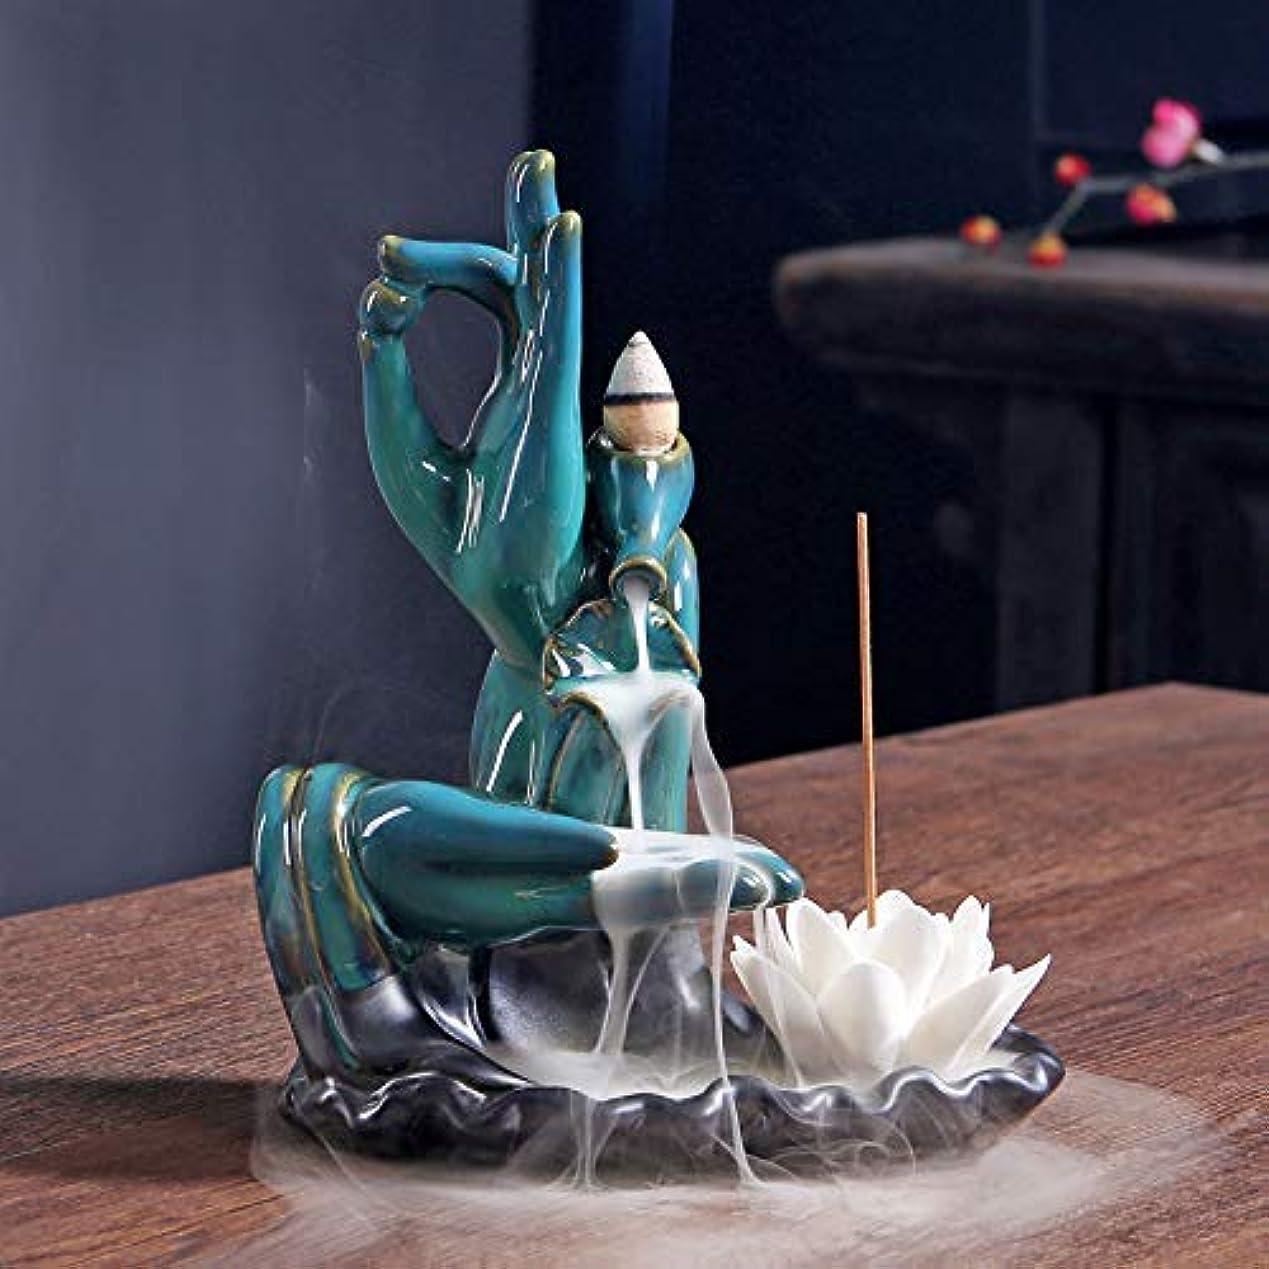 PHILOGOD blue Buddha hand backflow incense holder ceramics incense cone stick burner Creative Home Decoration...